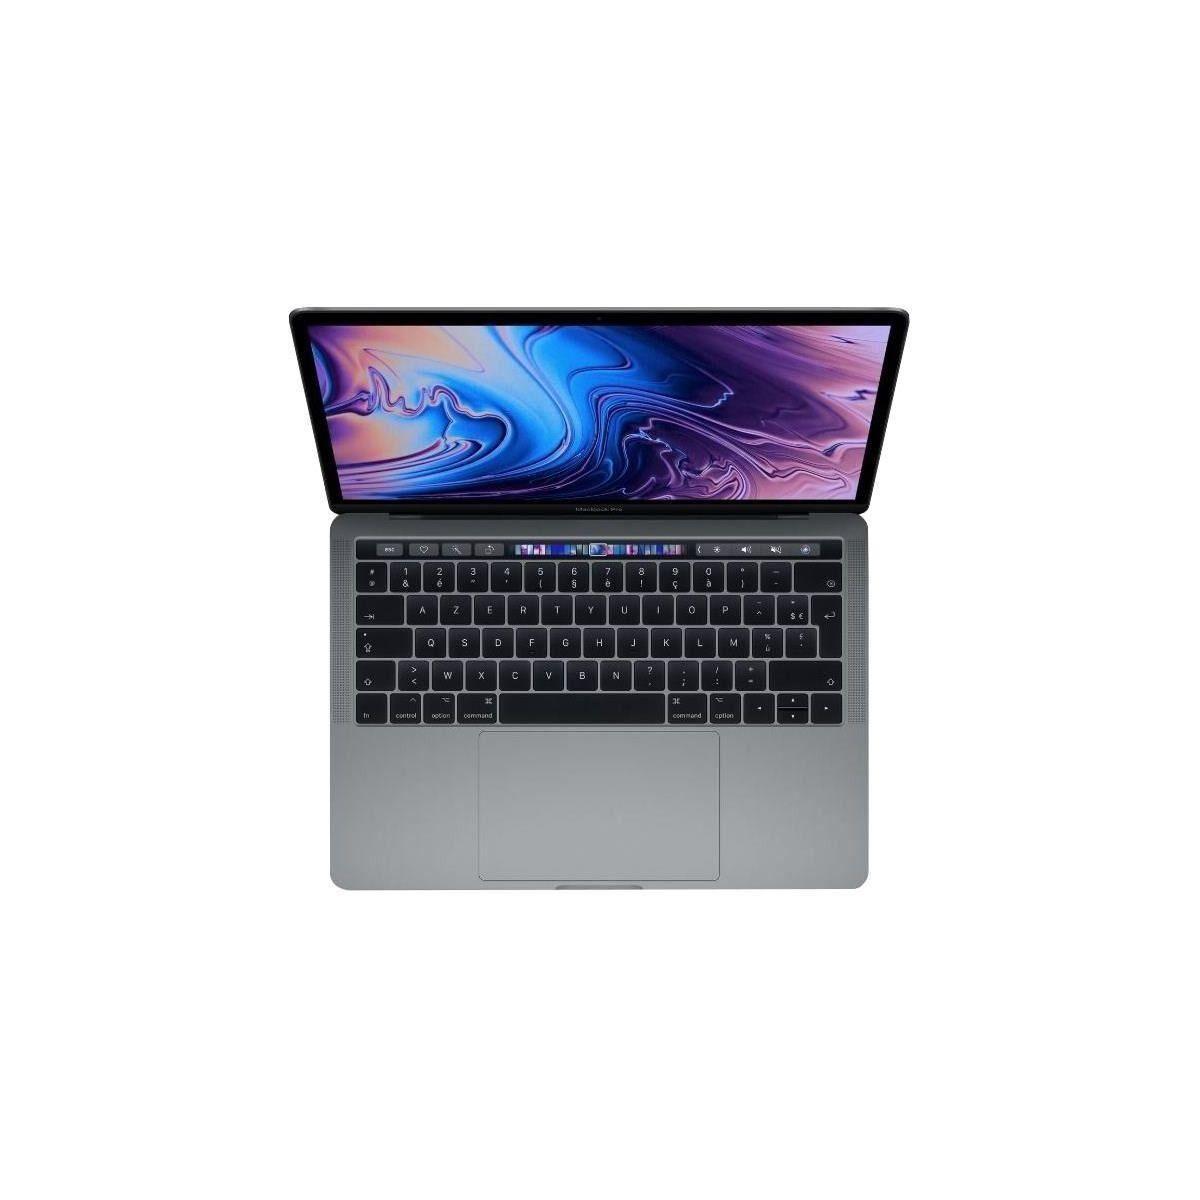 APPLE MacBook Pro MR9R2FN/A - 13,3 pouces Retina avec Touch Bar - Intel Core i5 - RAM 8Go - Stockage 512Go - Gris Sideral